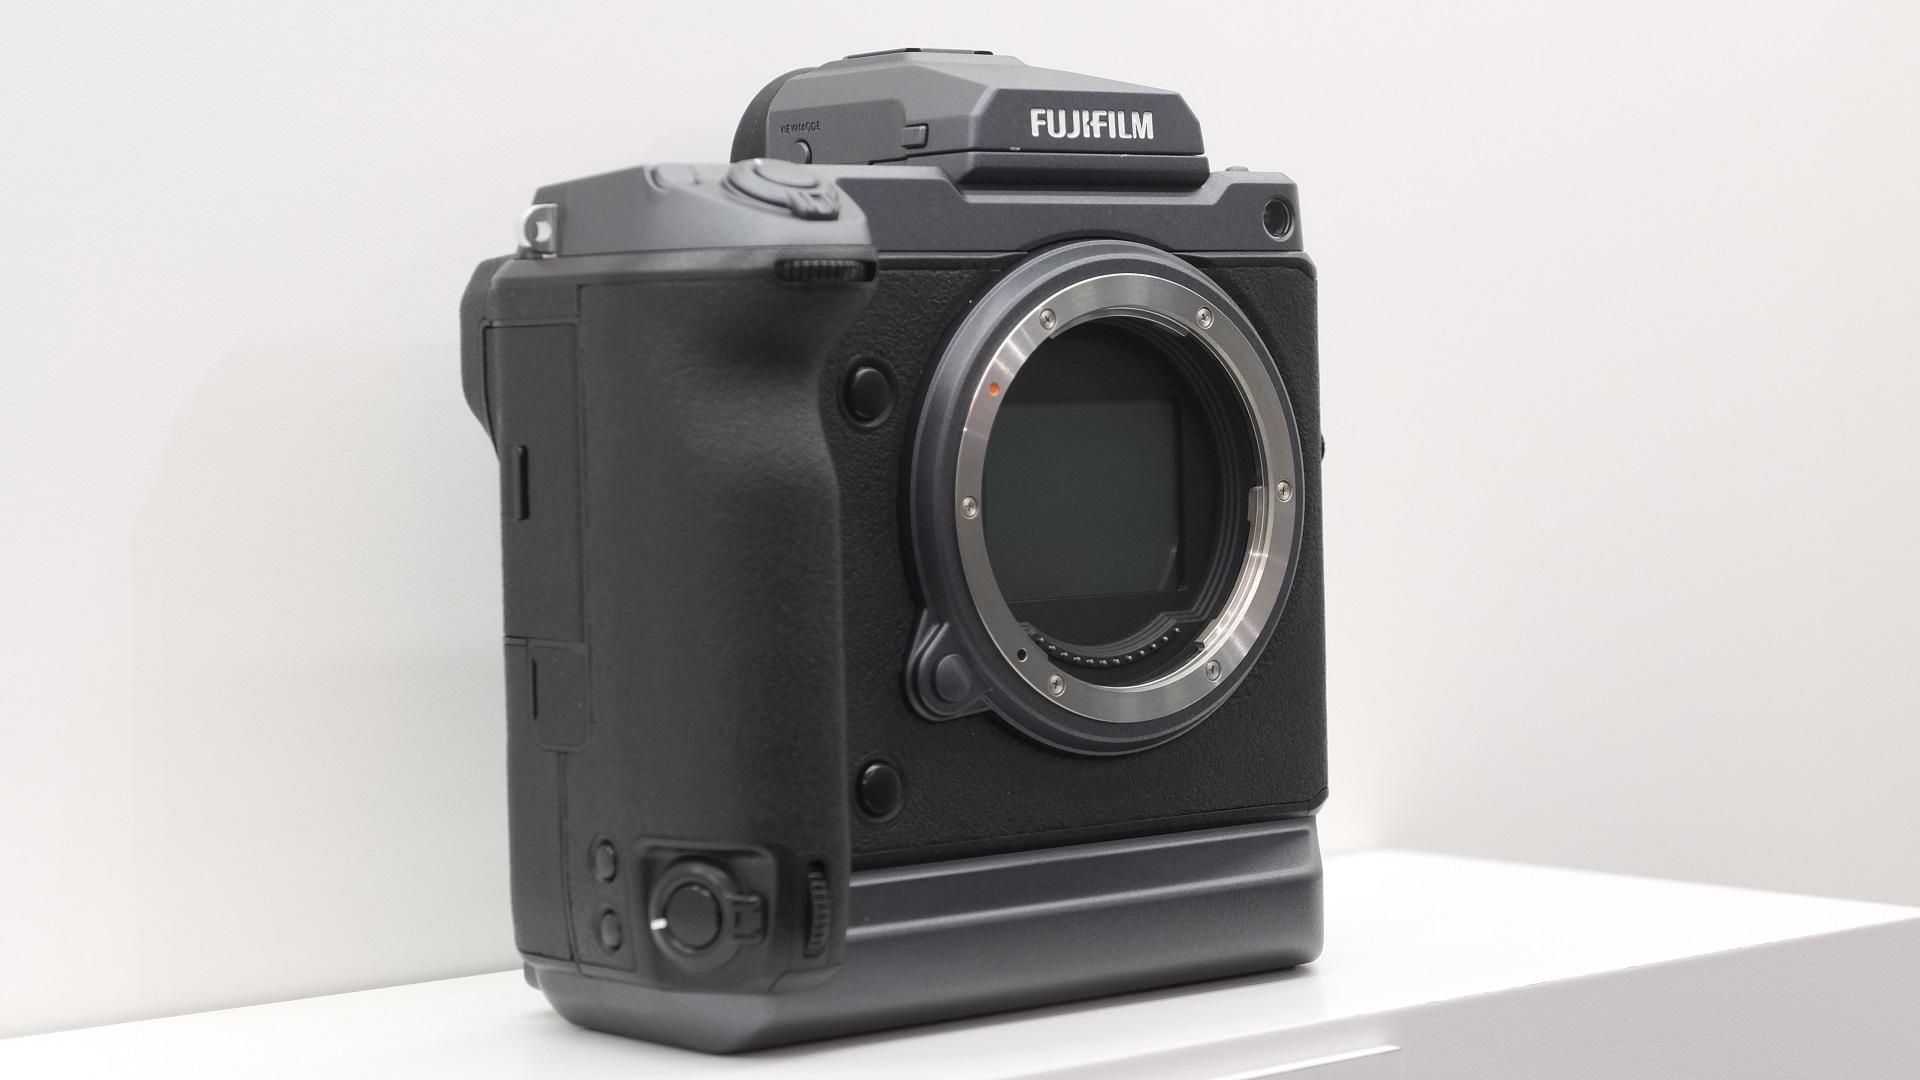 FUJIFILM GFX 100 - 4K, 10bit Medium Format Camera Concept